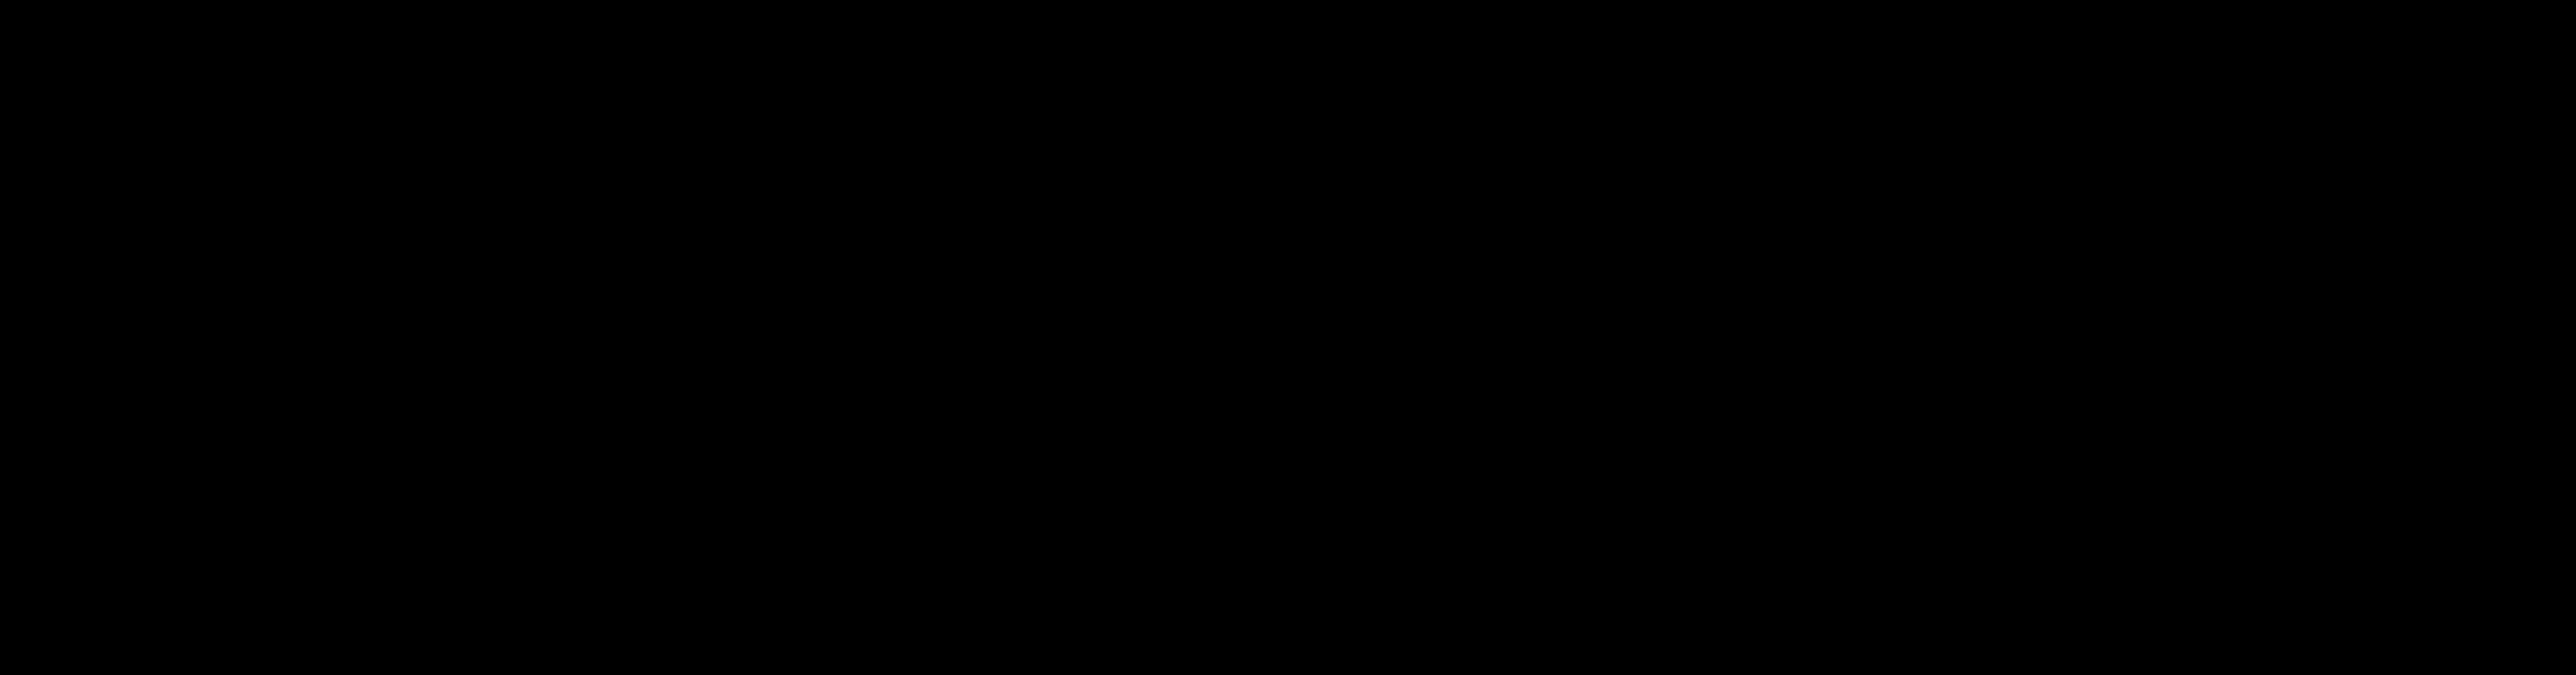 zeegee